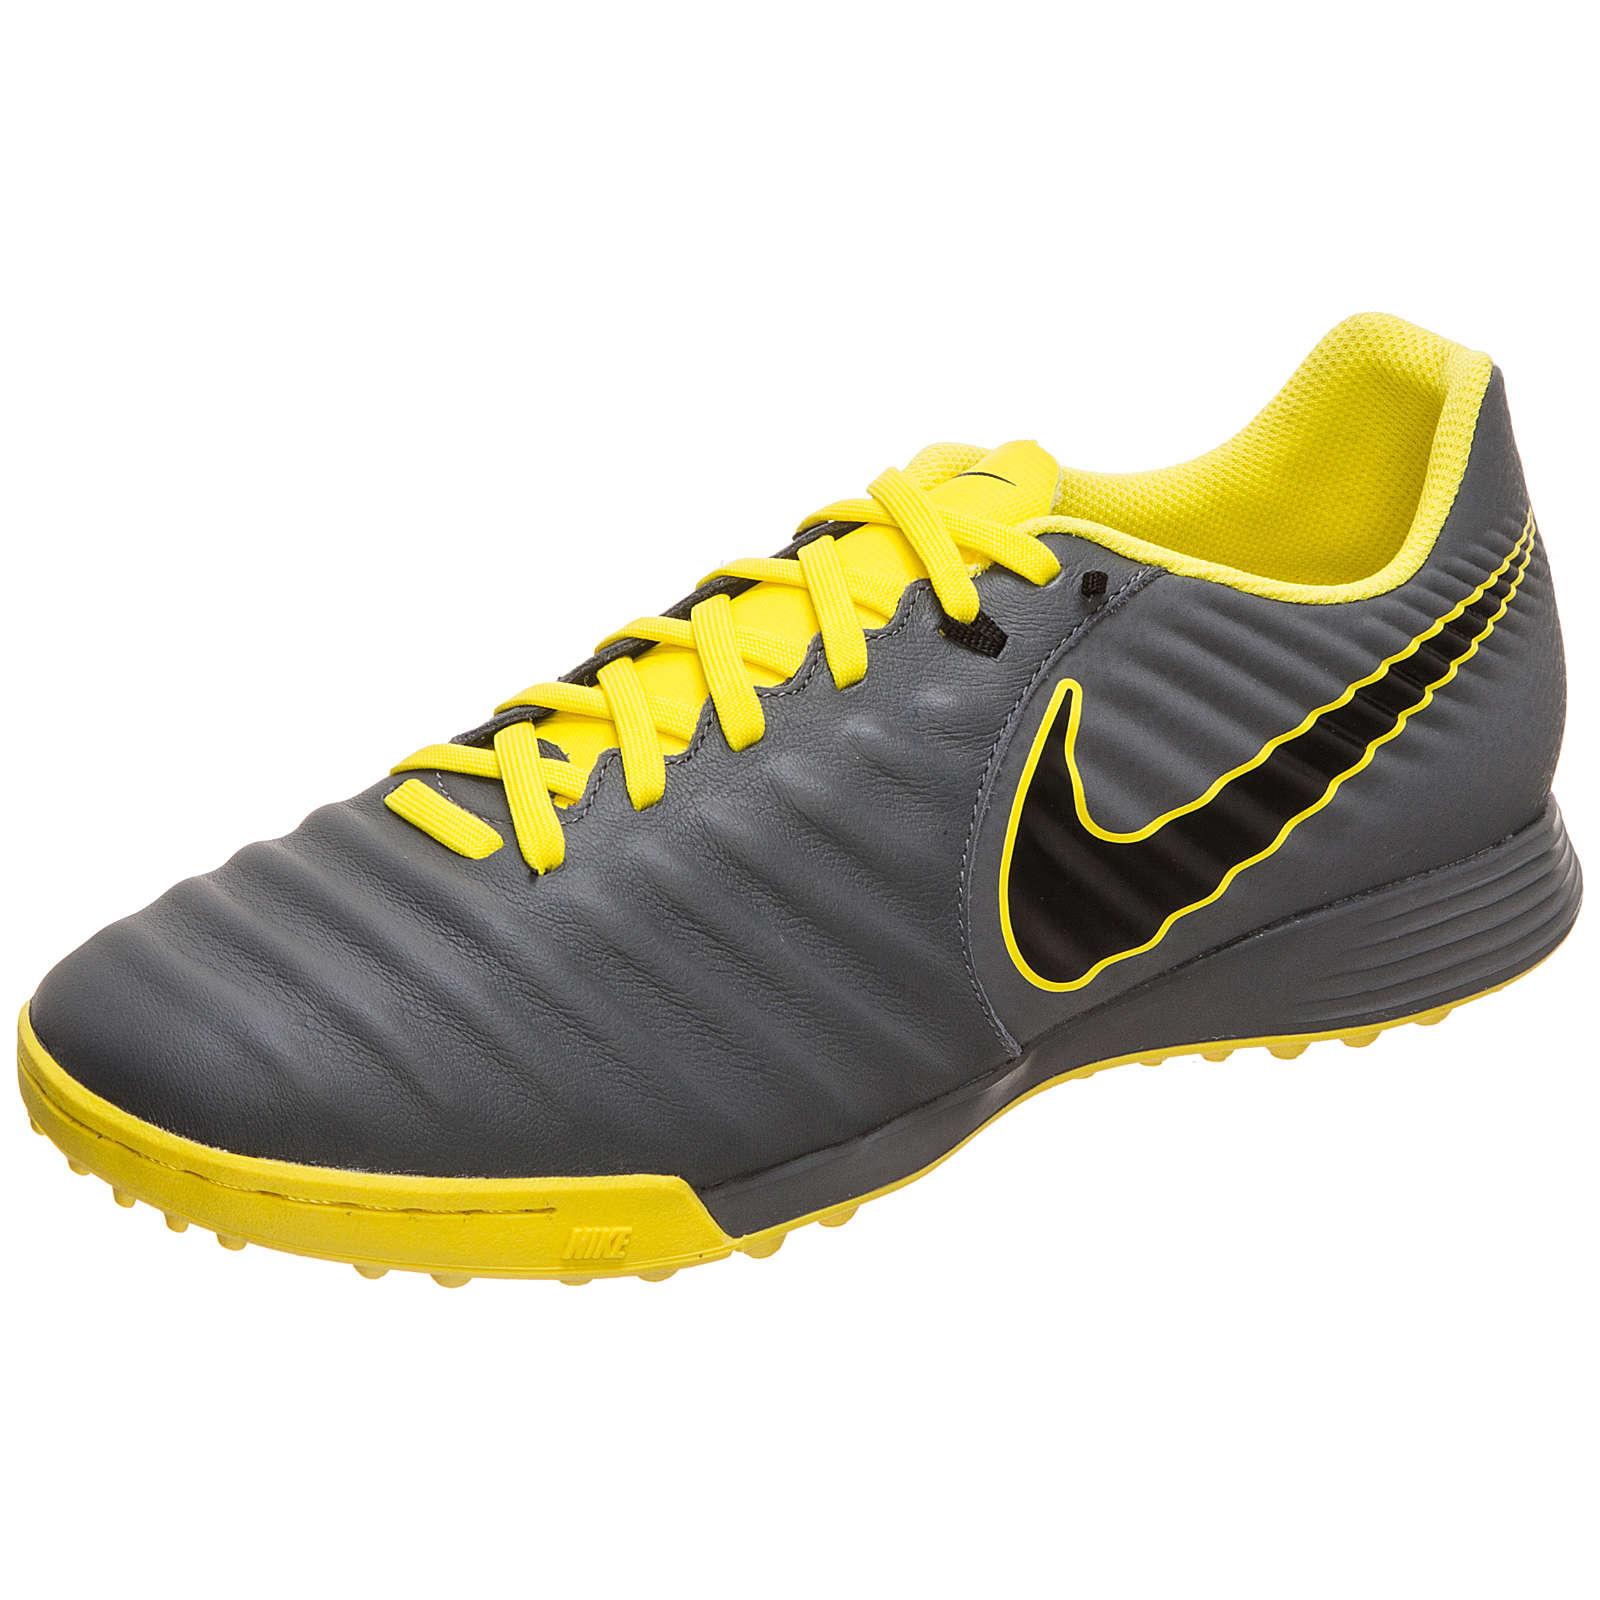 Nike Performance Tiempo LegendX VII Academy TF Fußballschuh Herren dunkelgrau Herren Gr. 44,5